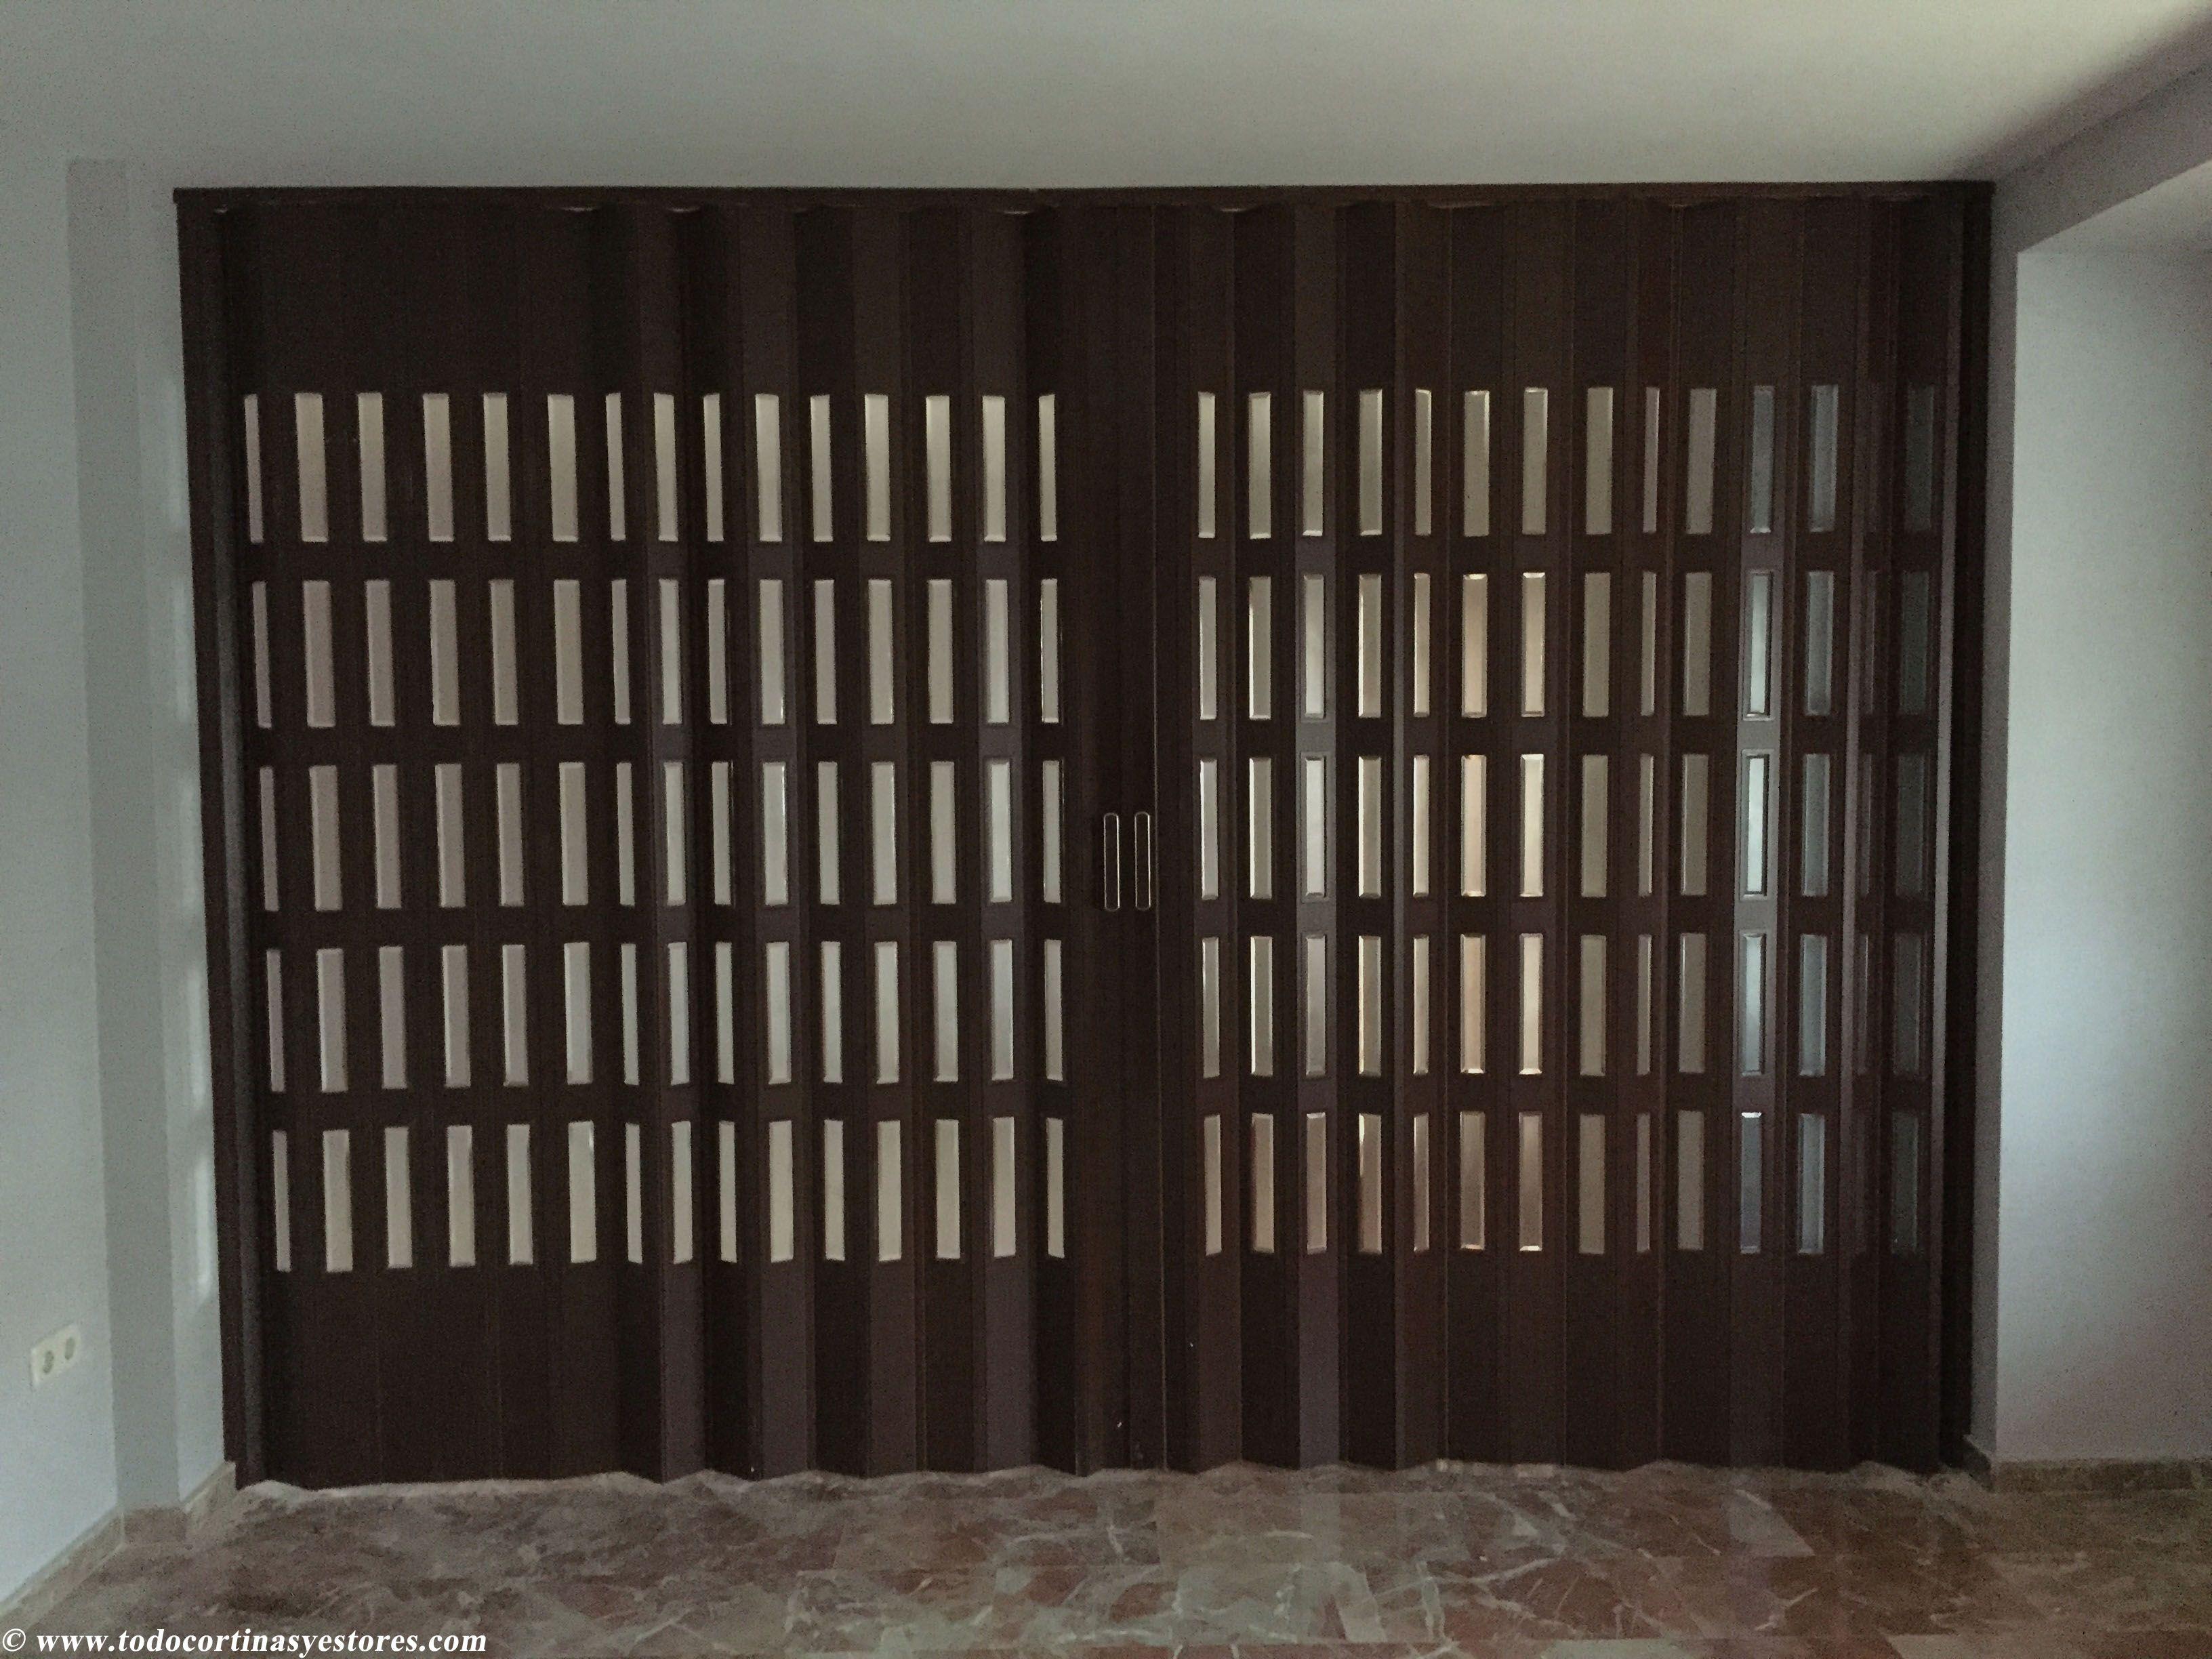 Puerta plegable de pvc puertas plegables de pvc pinterest - Puertas pvc plegables ...